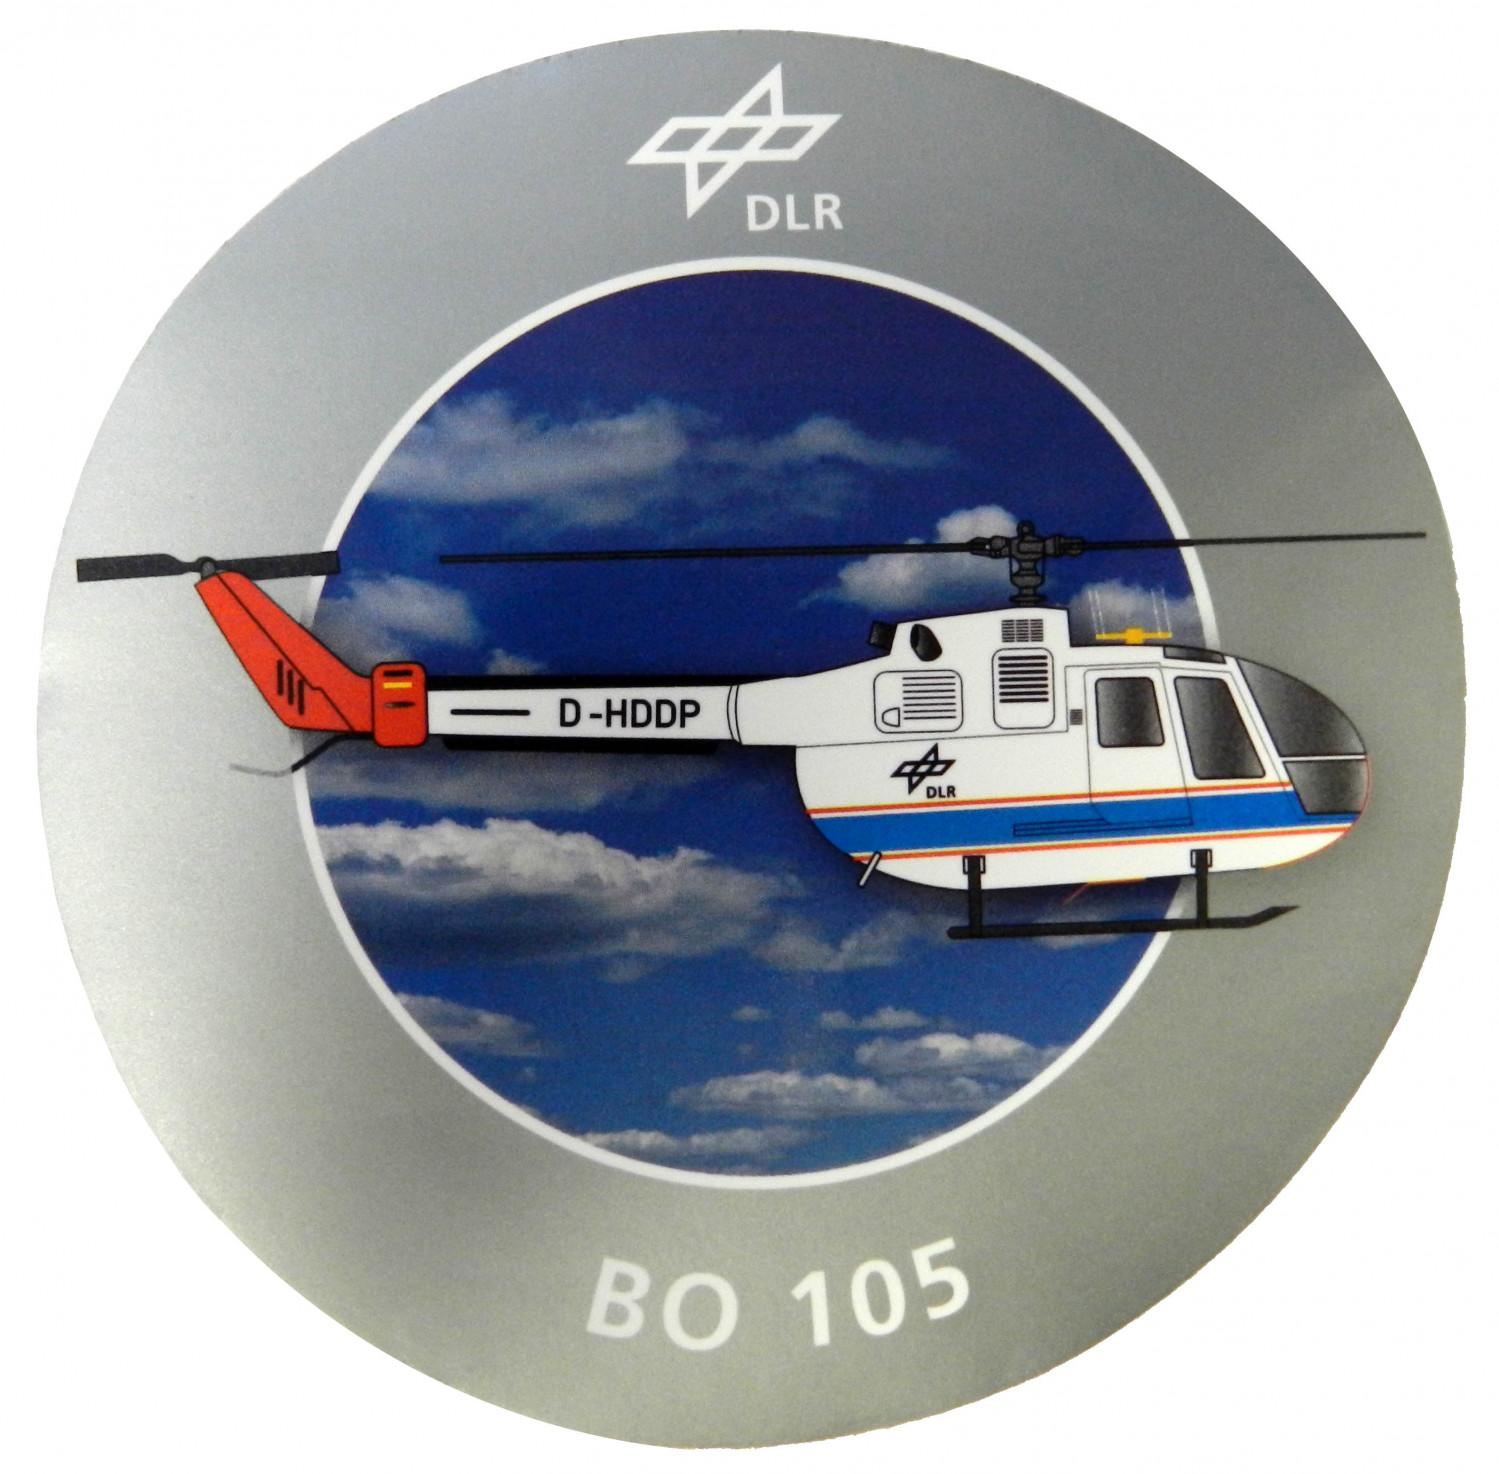 German Aerospace Centre (DLR) BO 105 Peel-Off Stick-On Badges